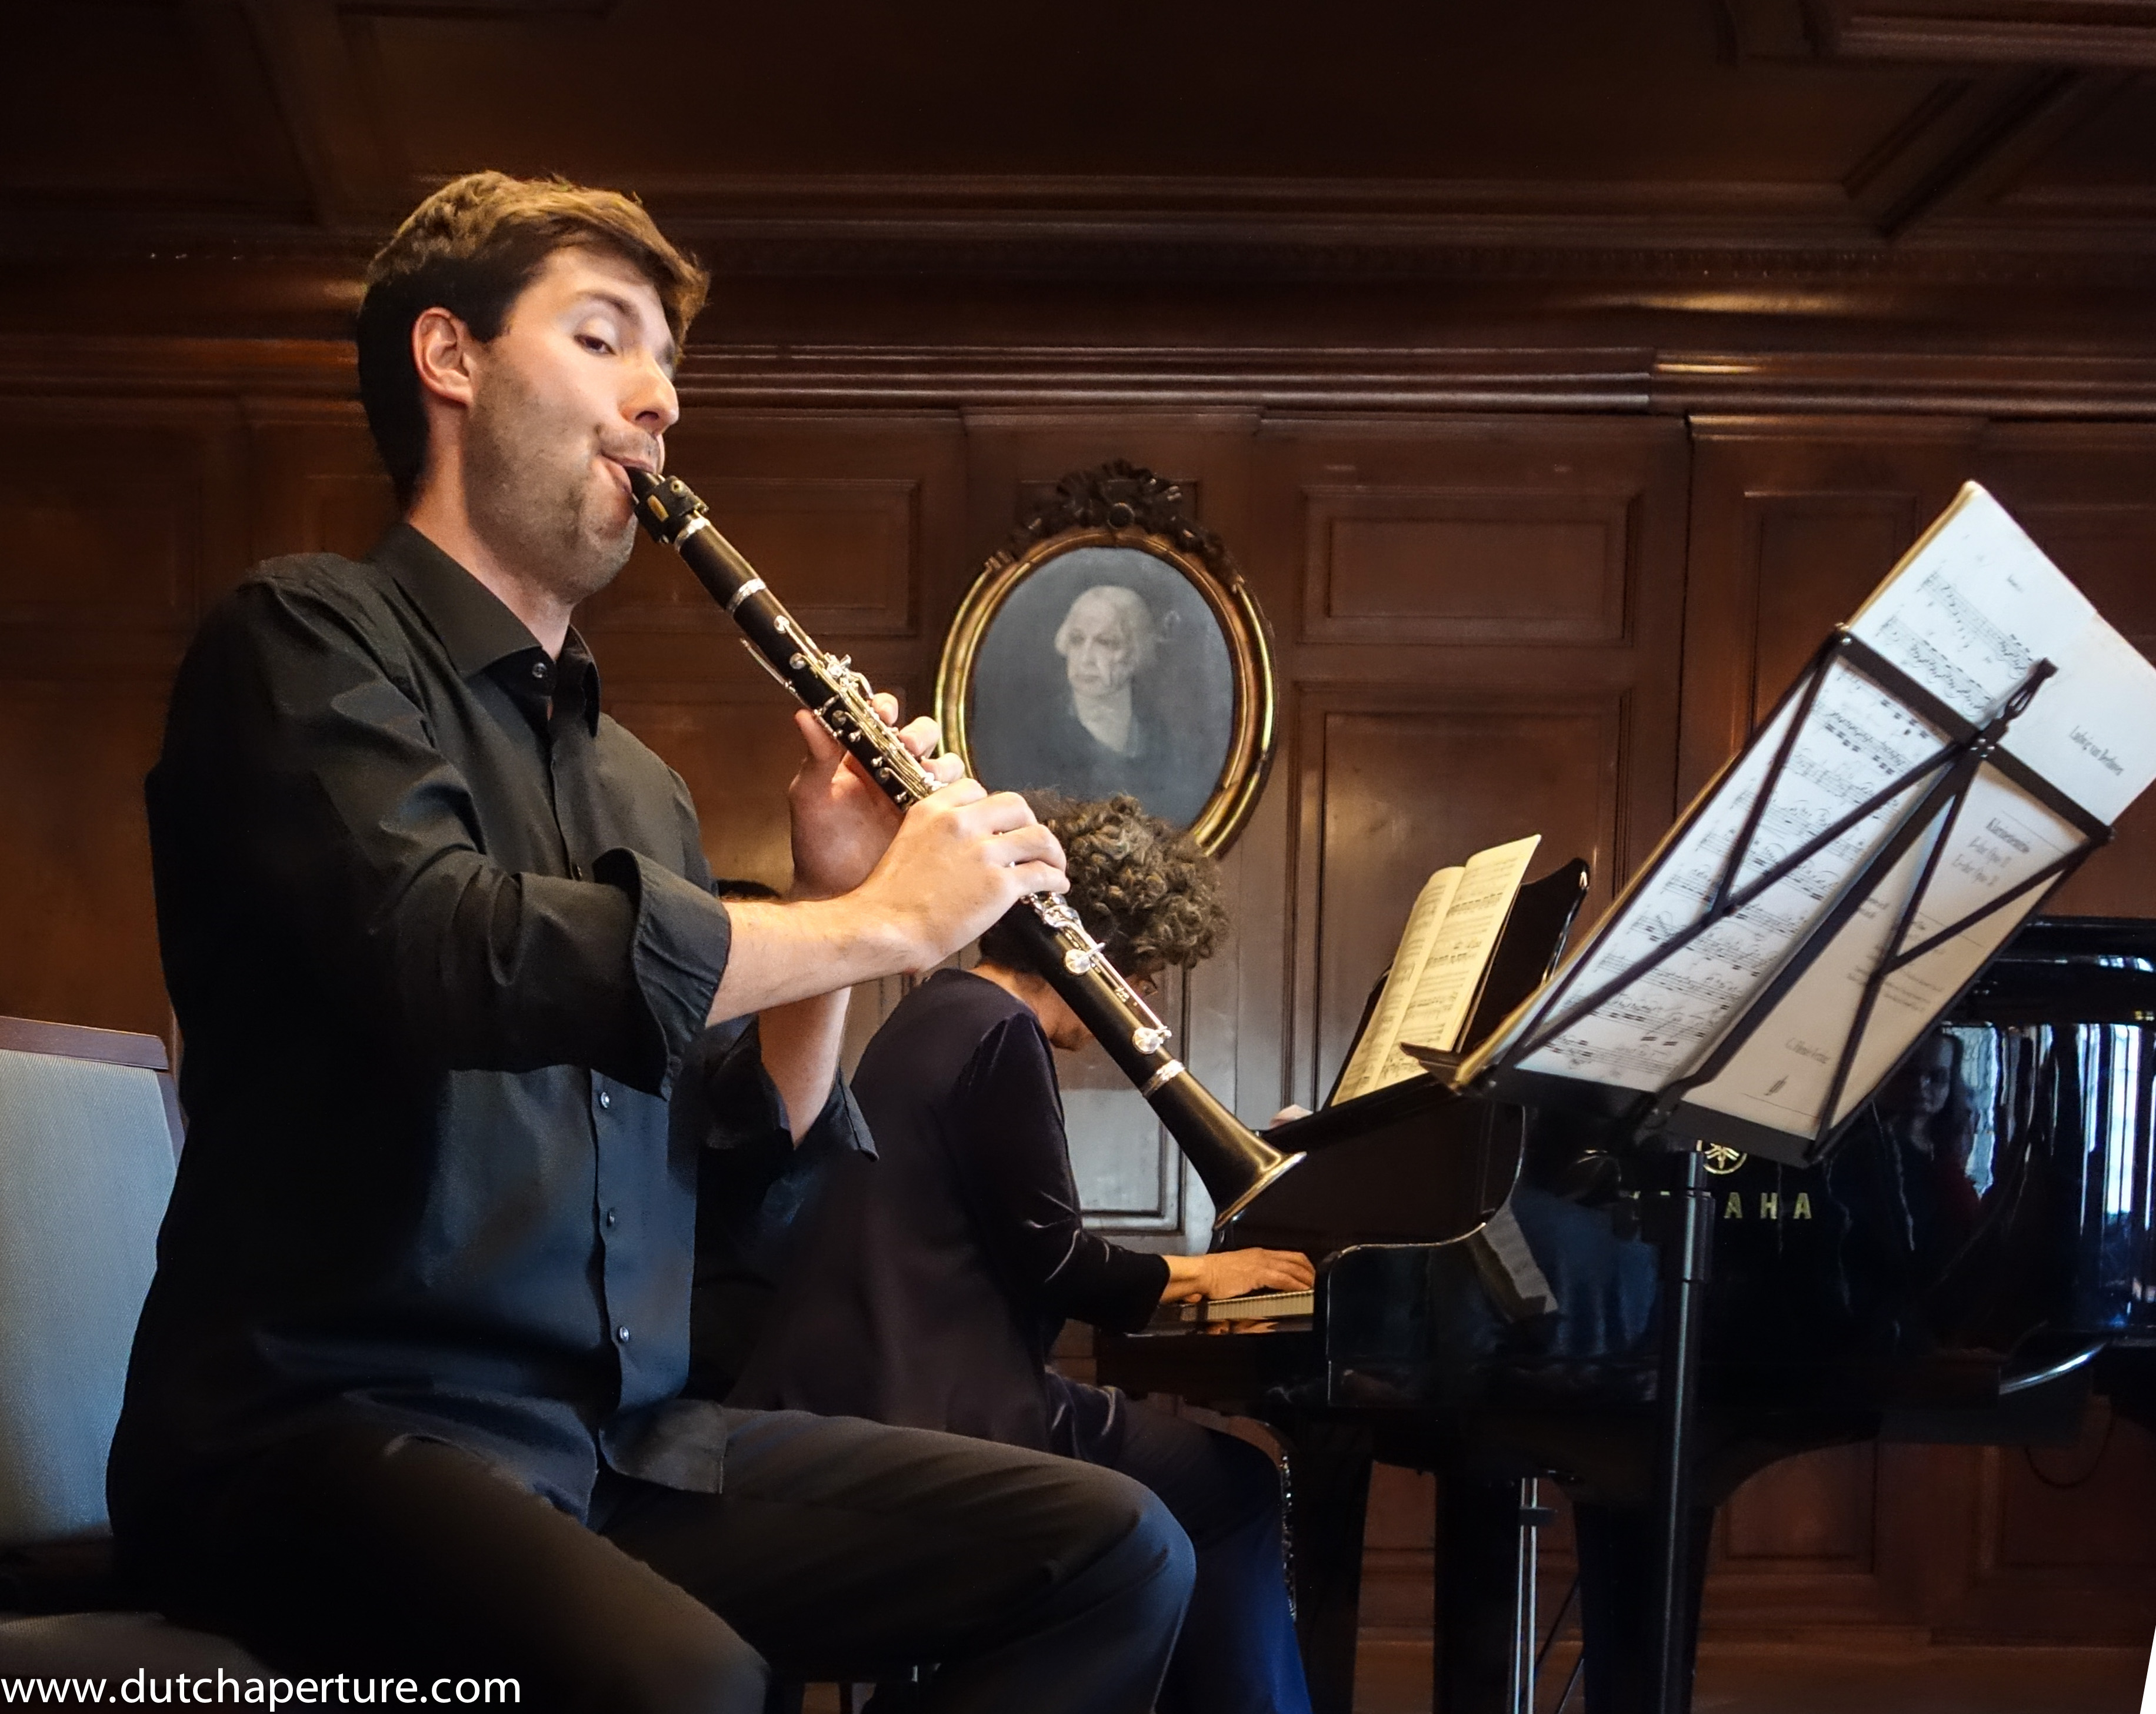 Bilder Concert Ayadin - Hopkins Marti - Hänni WP MP-10